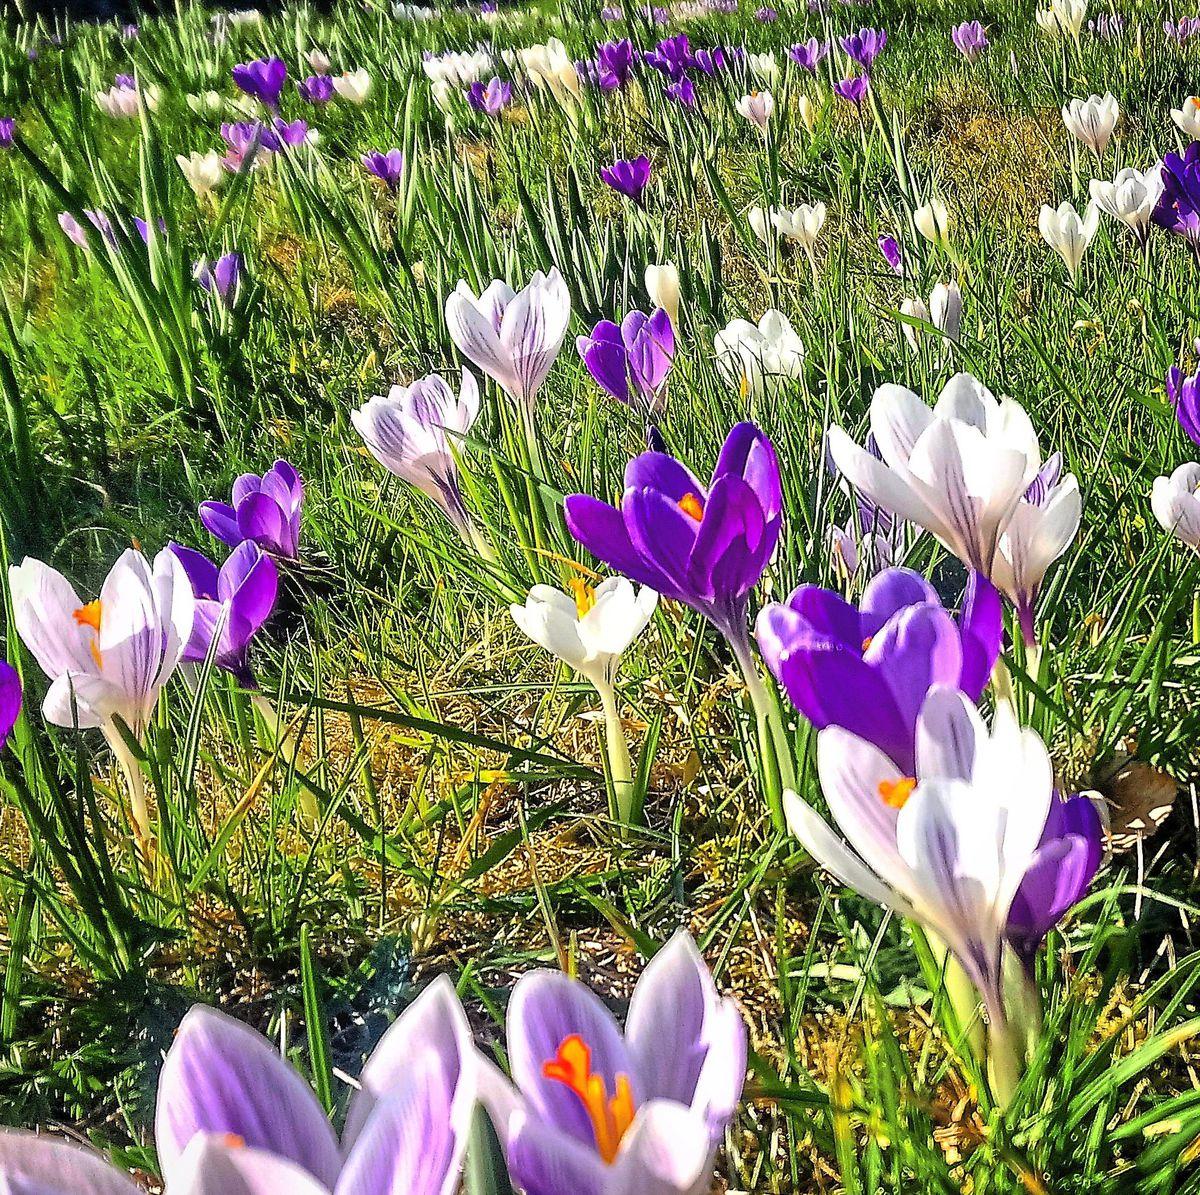 Spring flowers snapped at Clive Church, near Shrewsbury, by Scott Roberts/@shrews01